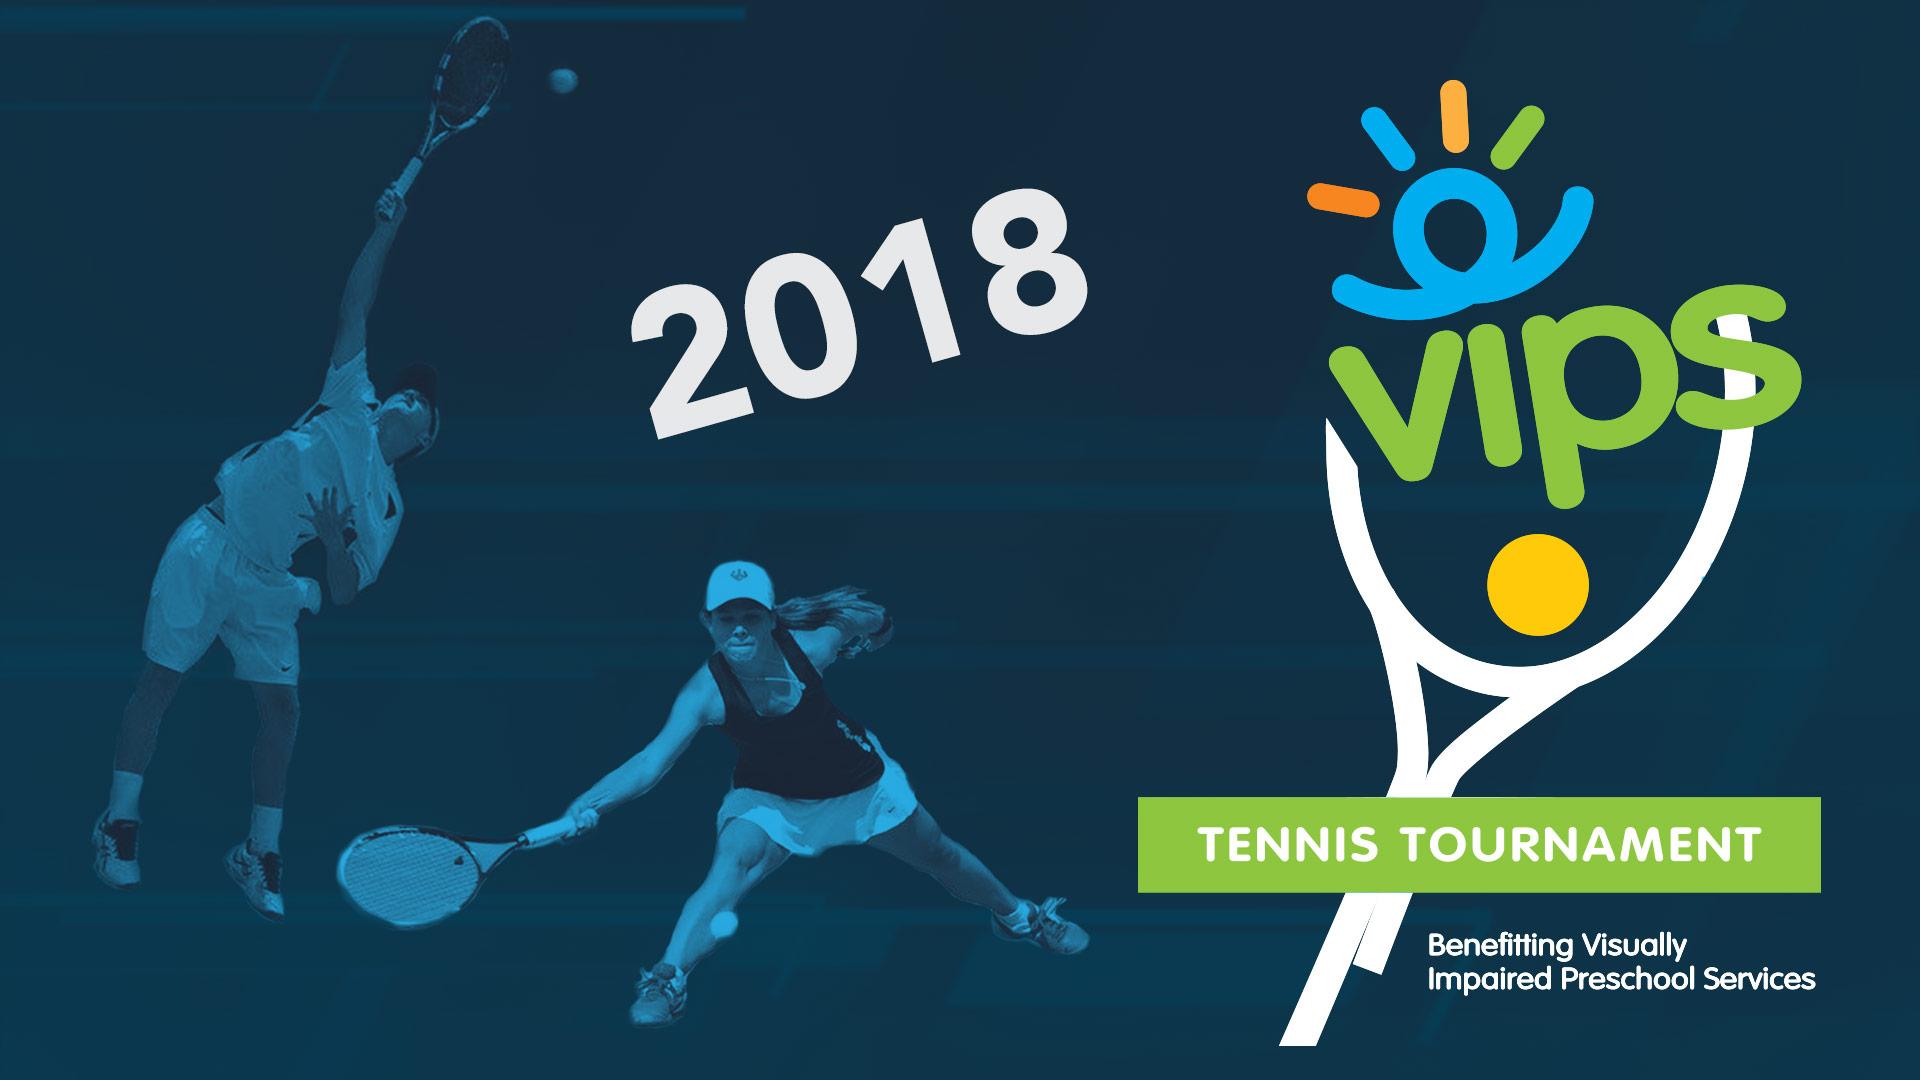 tennis-tournament-2018_bg